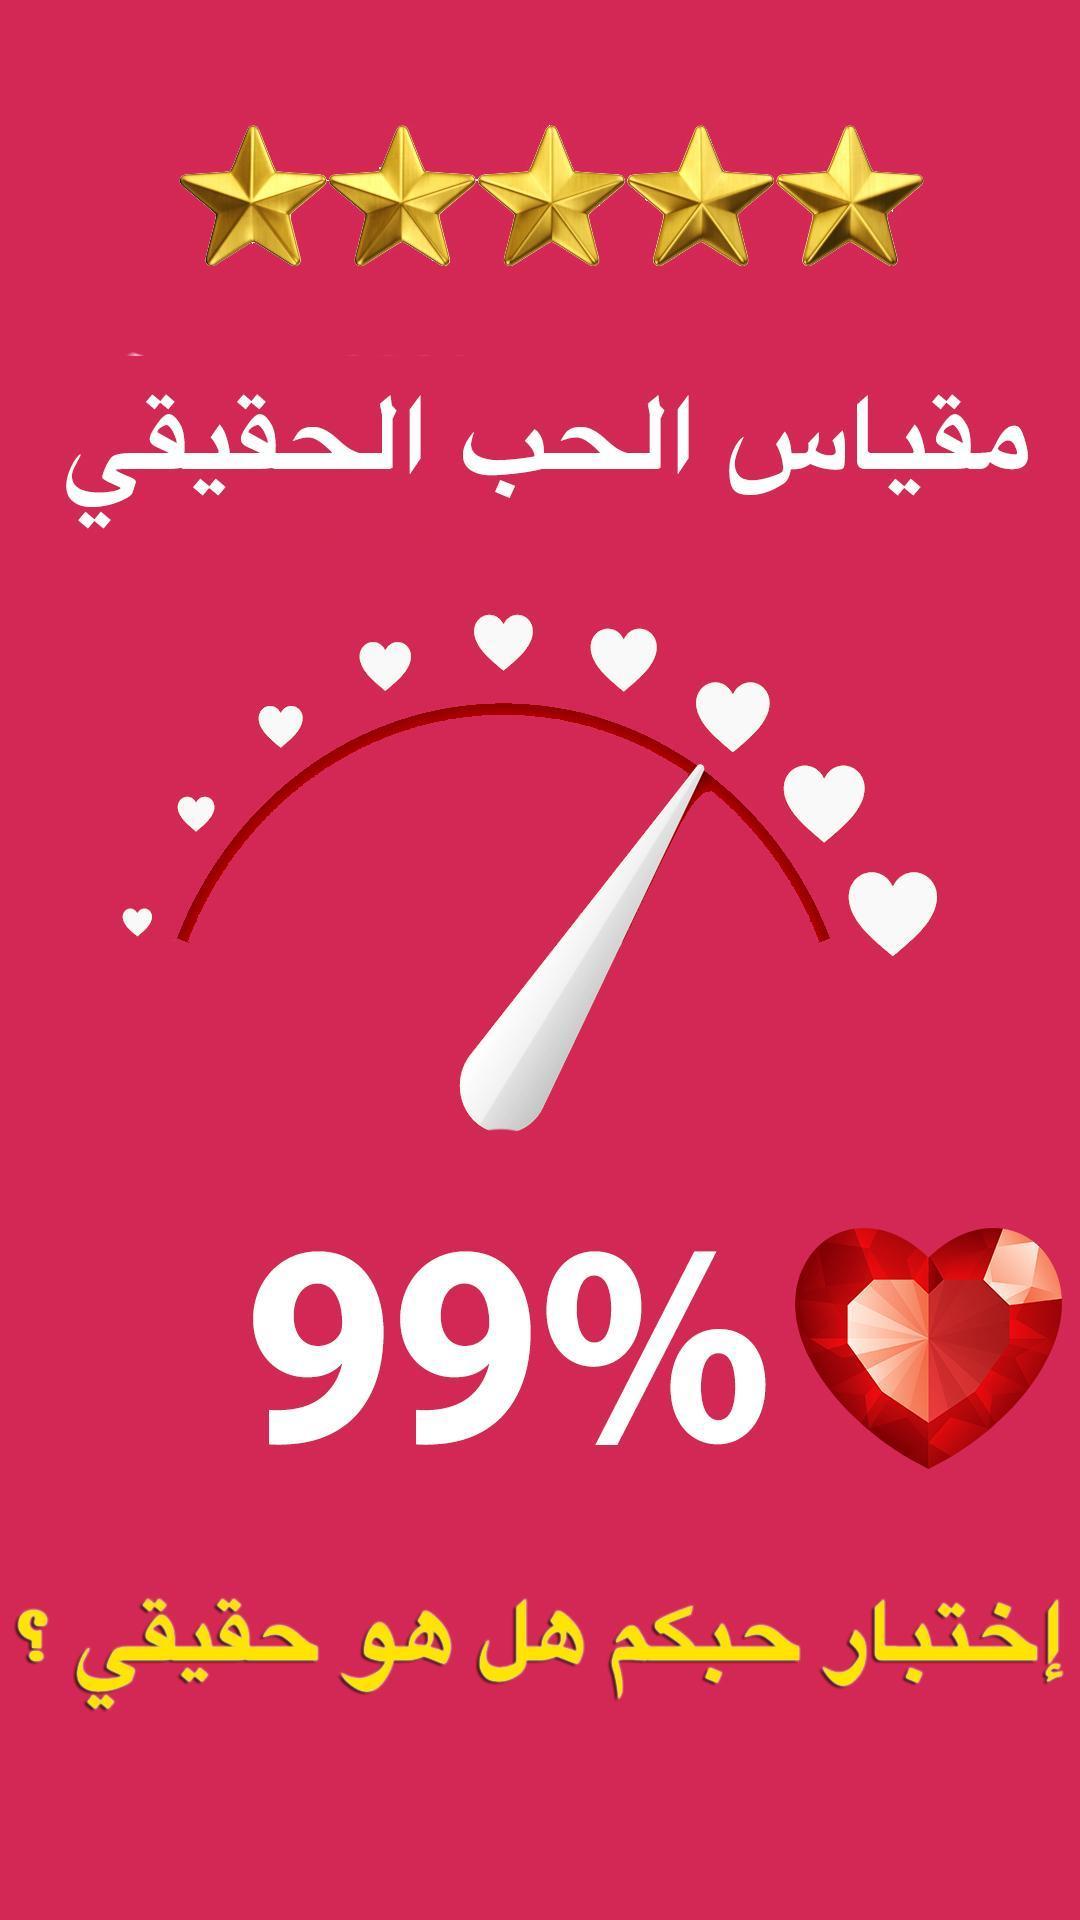 مقياس الحب For Android Apk Download